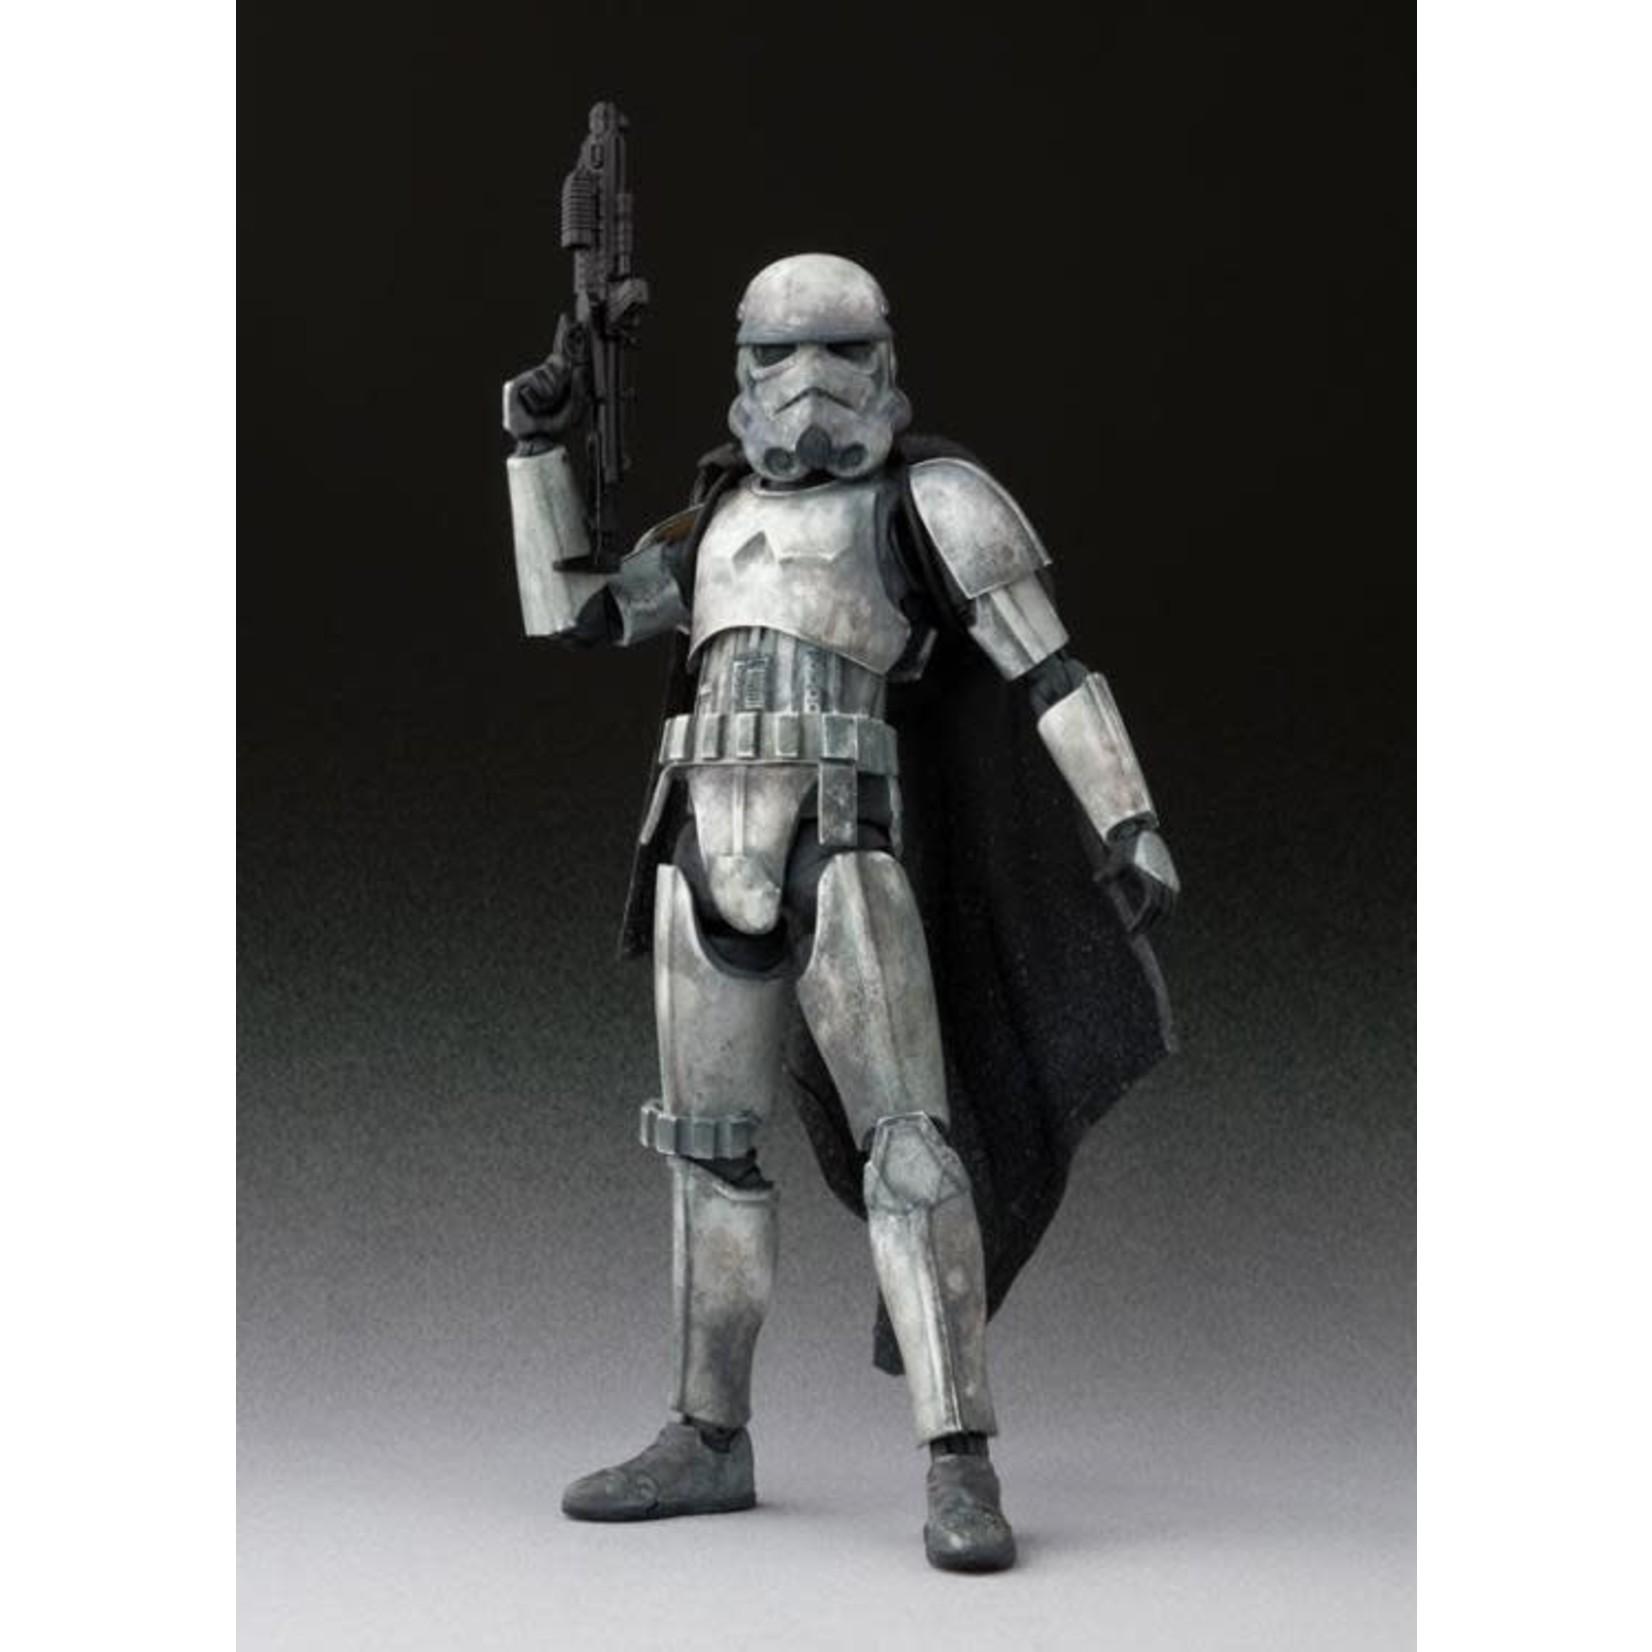 Bandai Star Wars S.H.Figuarts Mimban Stormtrooper